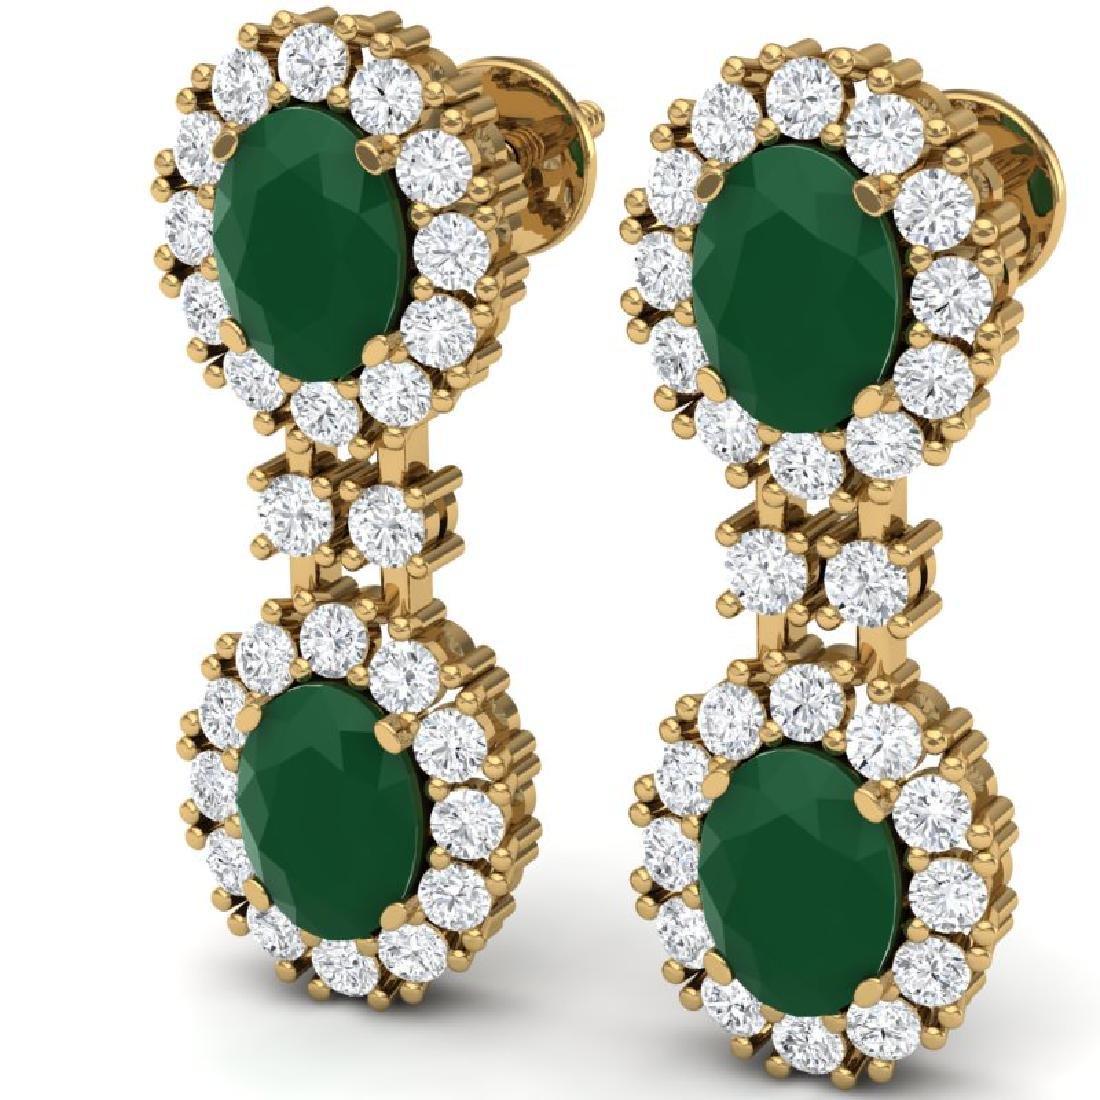 8.98 CTW Royalty Emerald & VS Diamond Earrings 18K - 2